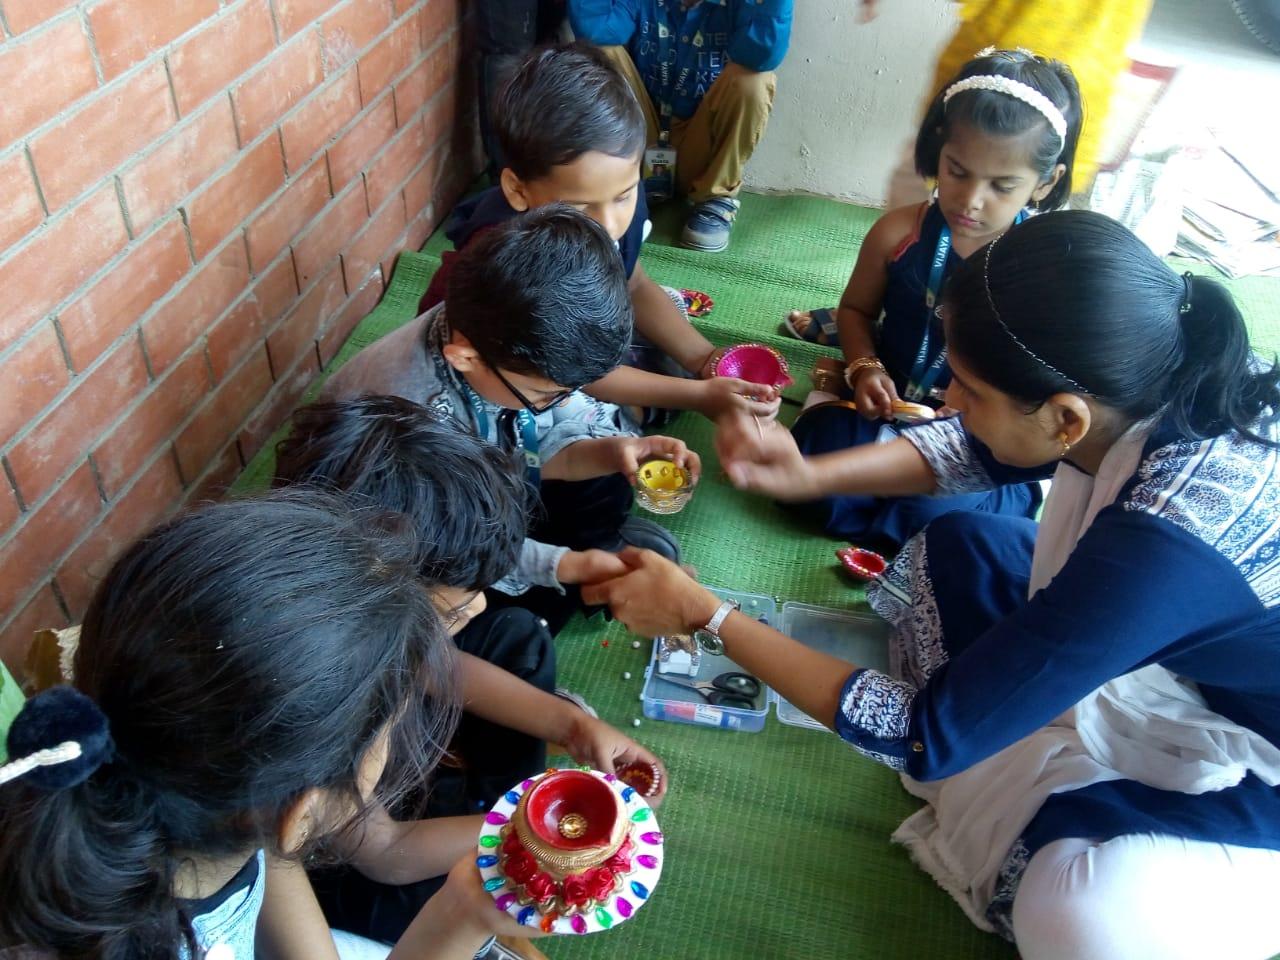 diya-making-activity-vijaya-convent-school-amravati